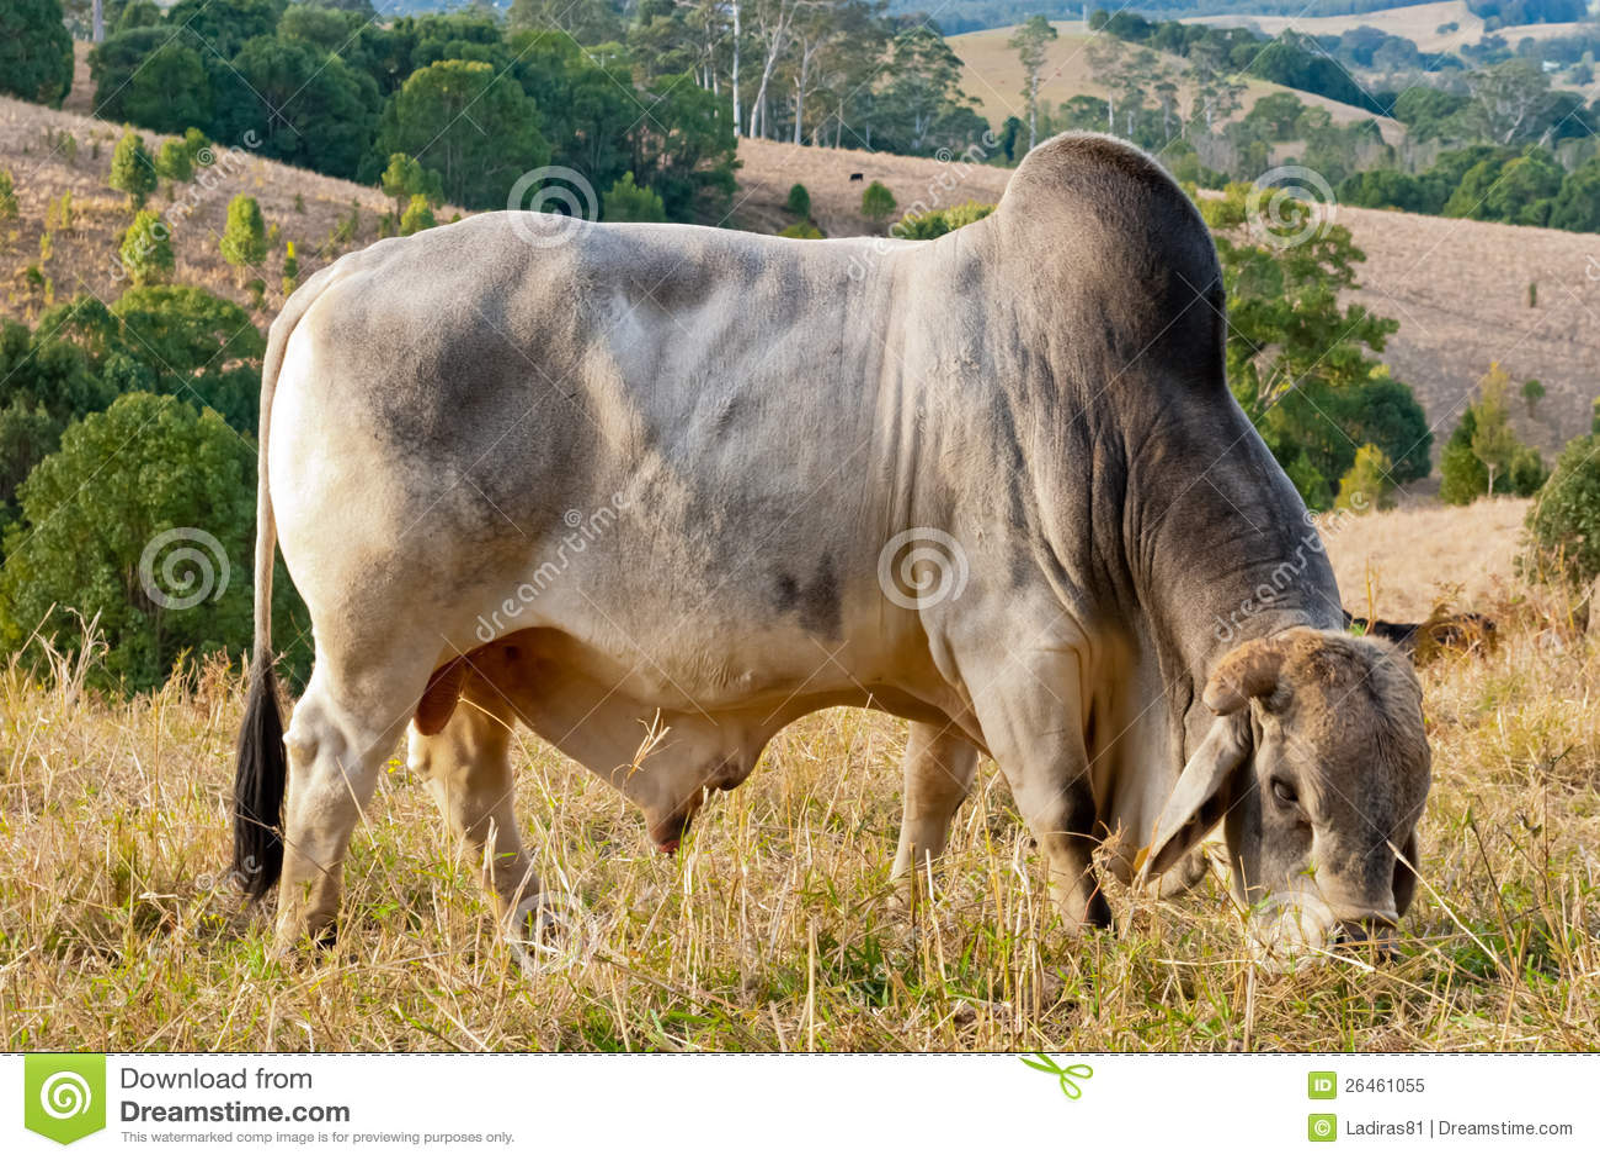 Zébu sauvage dans un horizontal rural paisible